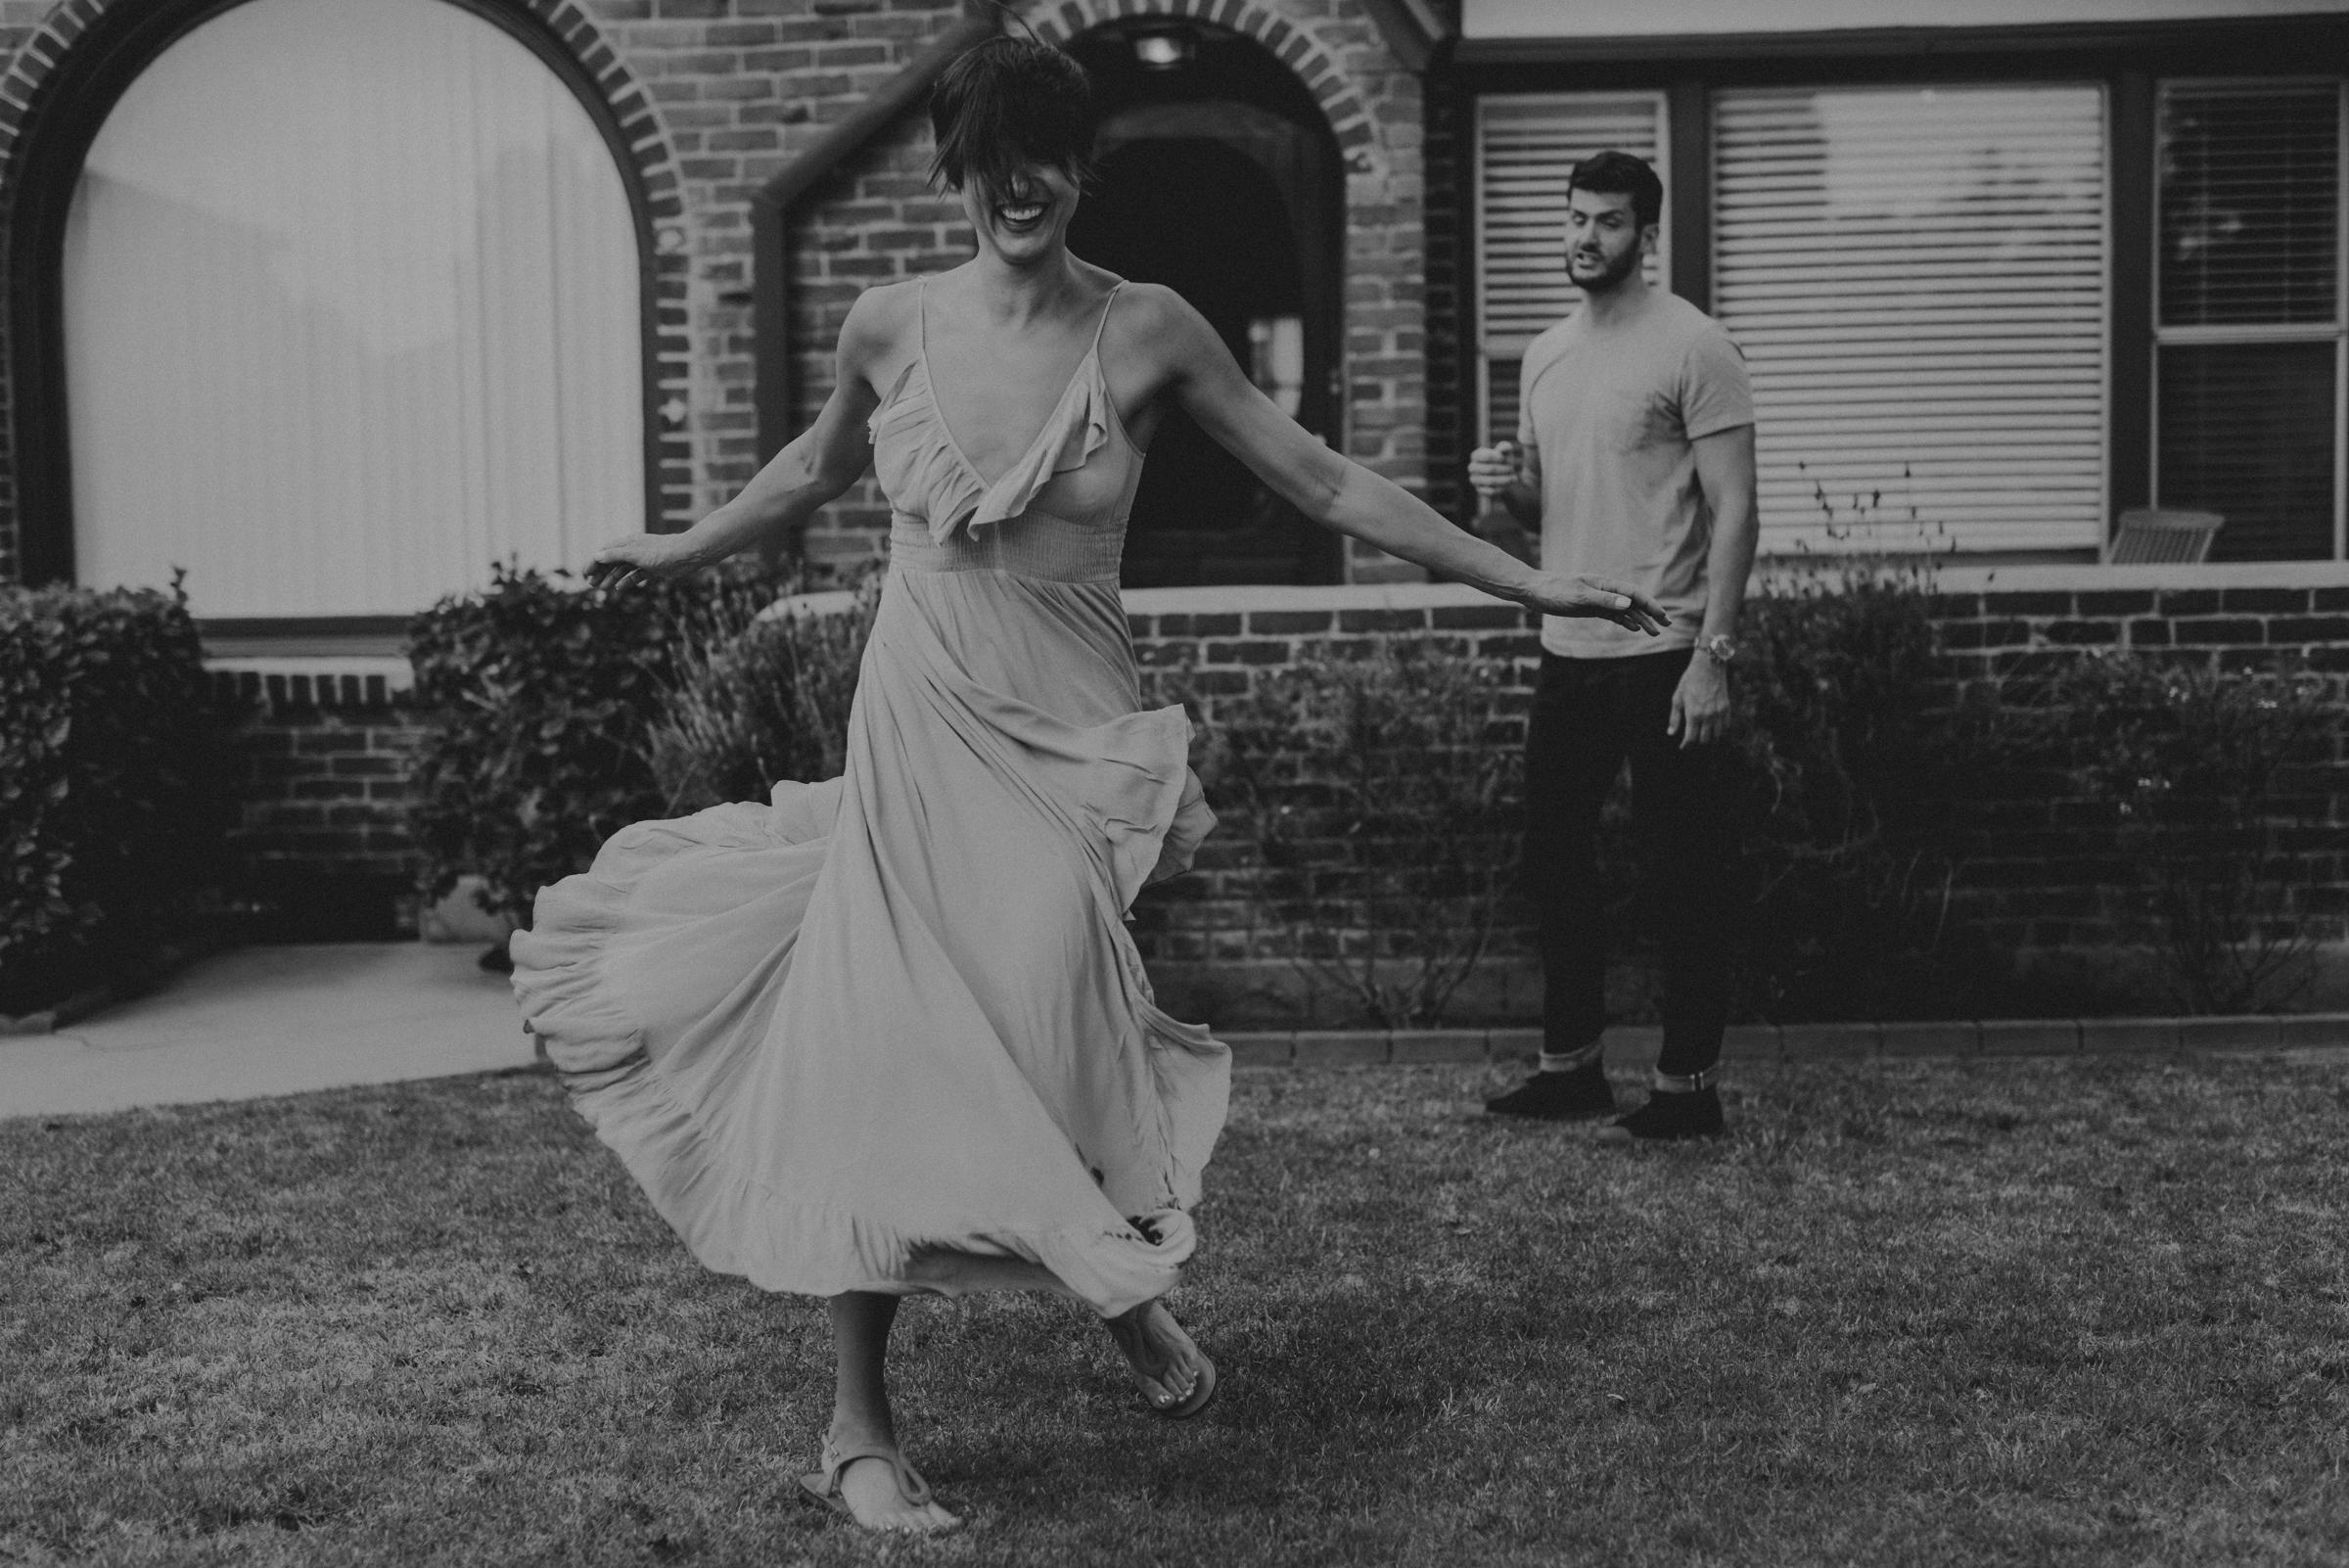 Isaiah + Taylor Photography - Venice Beach & Santa Monica Engagement Session, Los Angeles Wedding Photographer-023.jpg